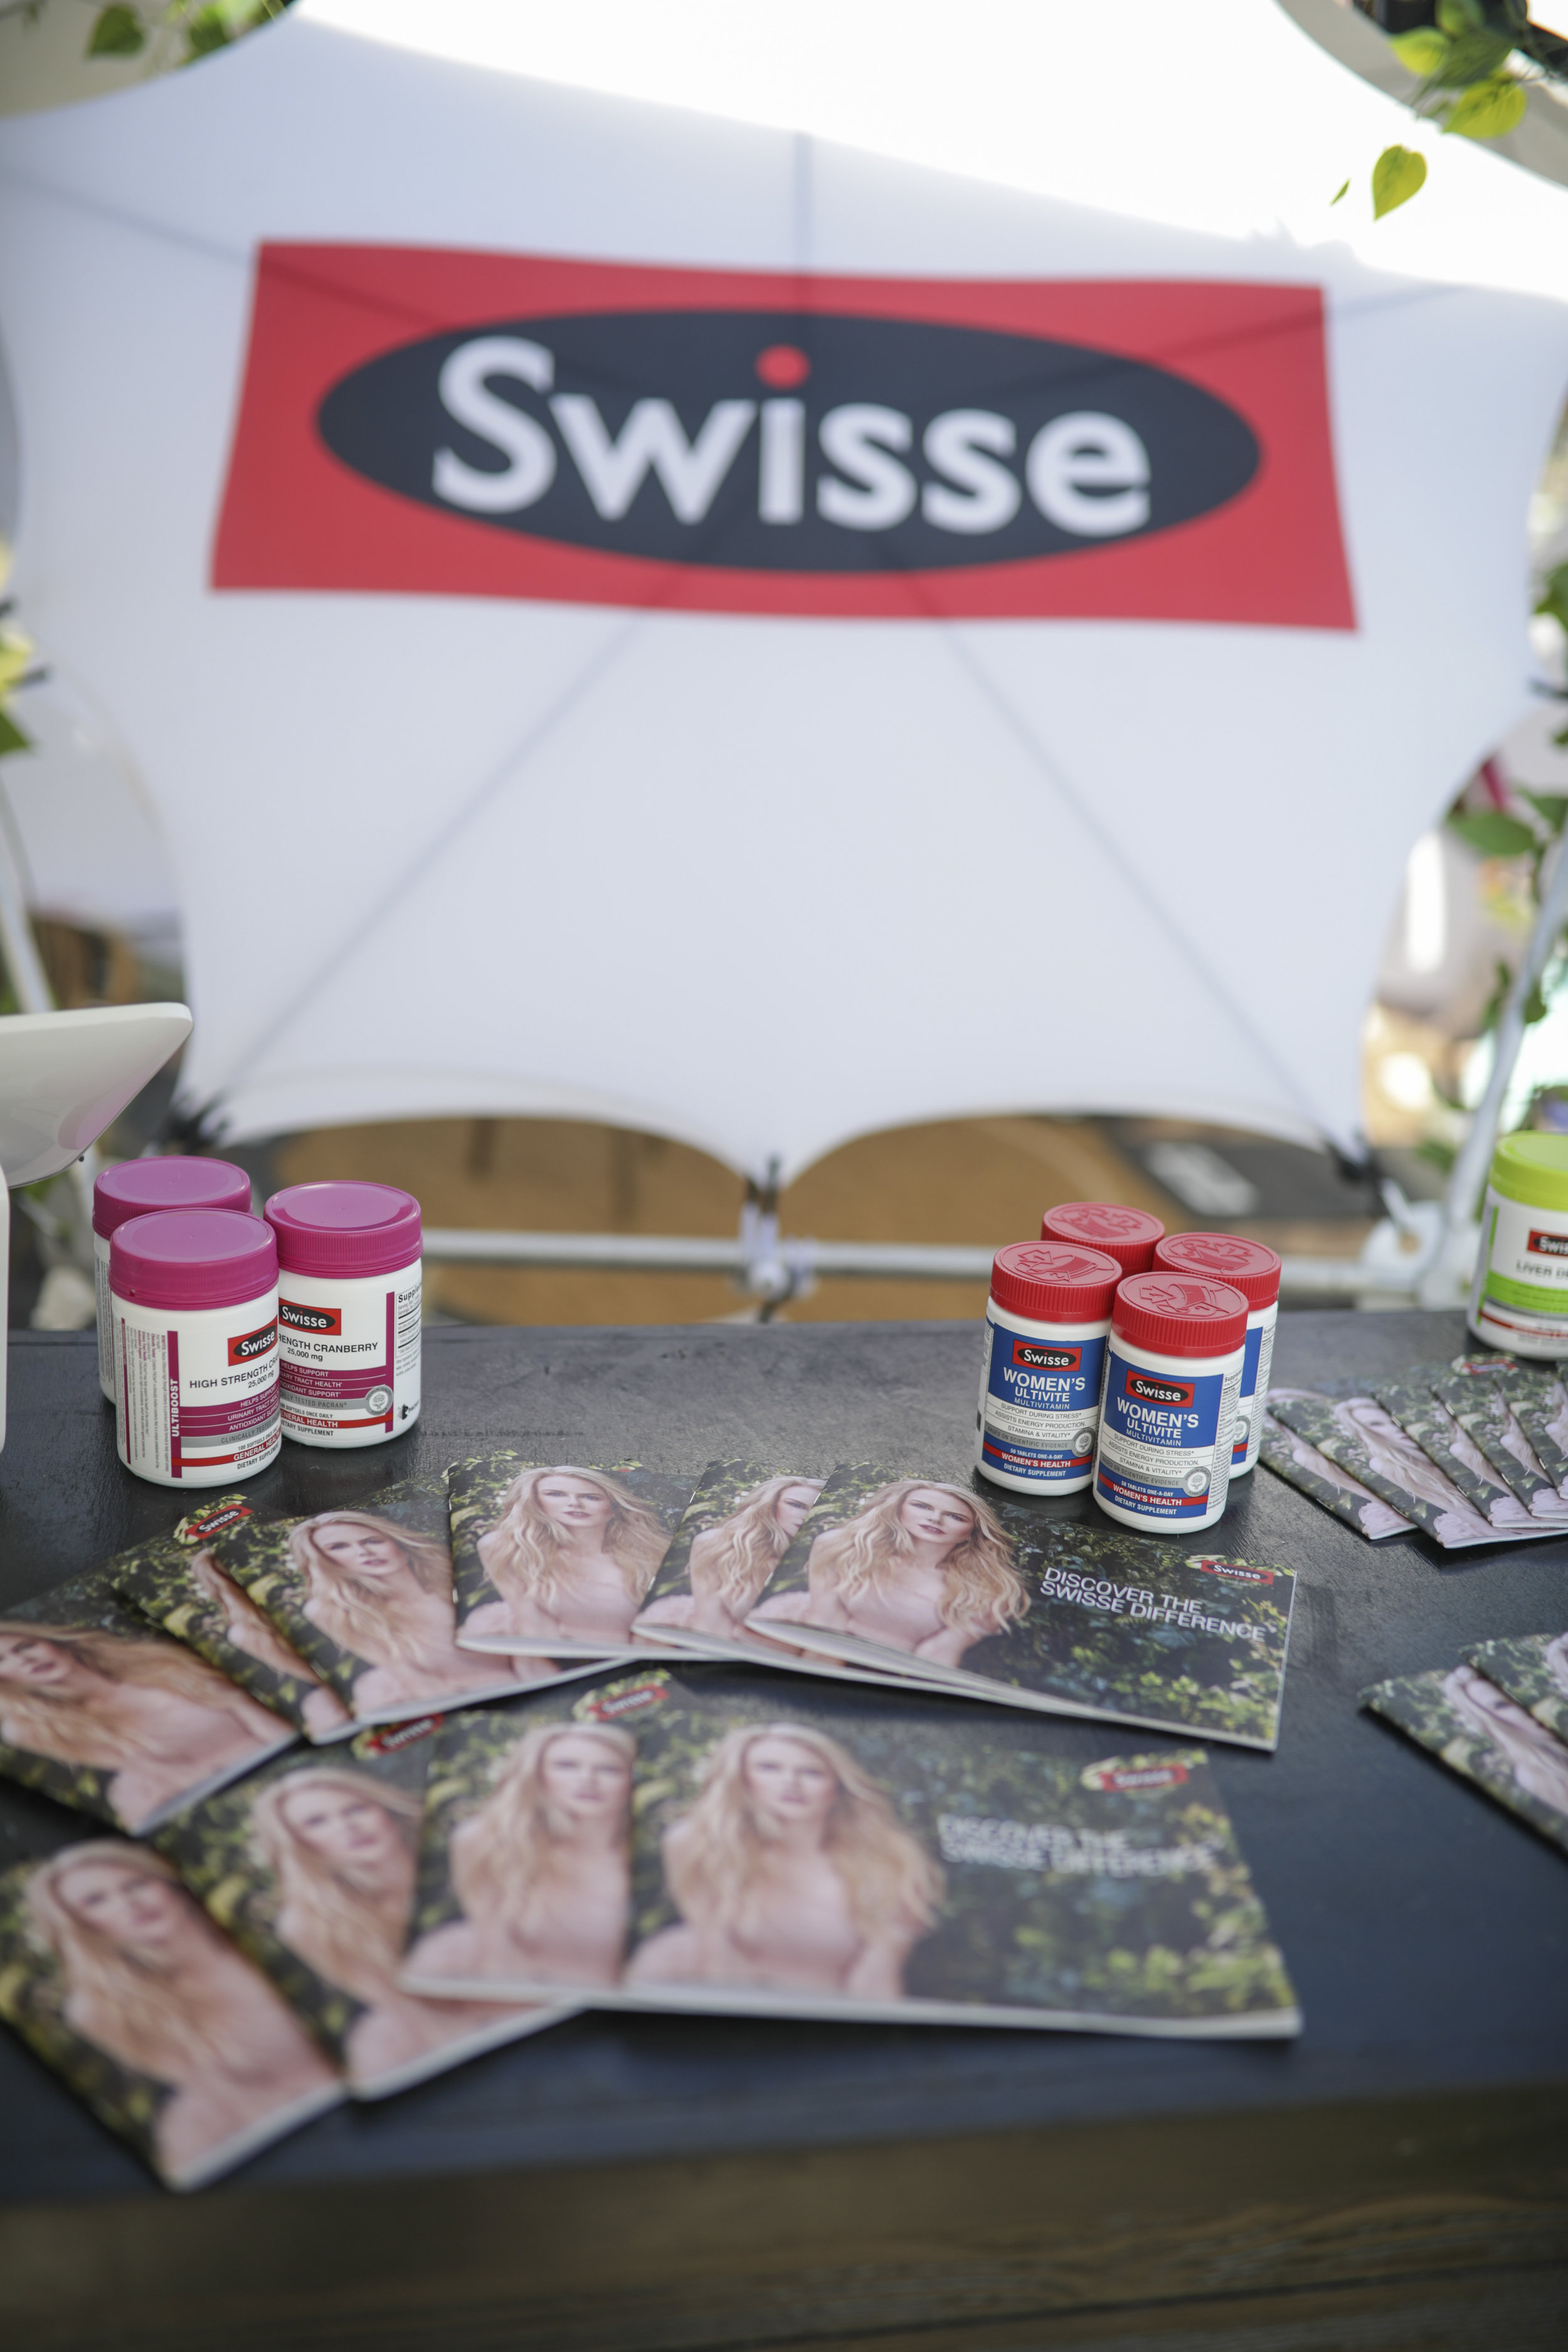 O Hello Media-Swisse-Wanderlust-A81A0428.jpg